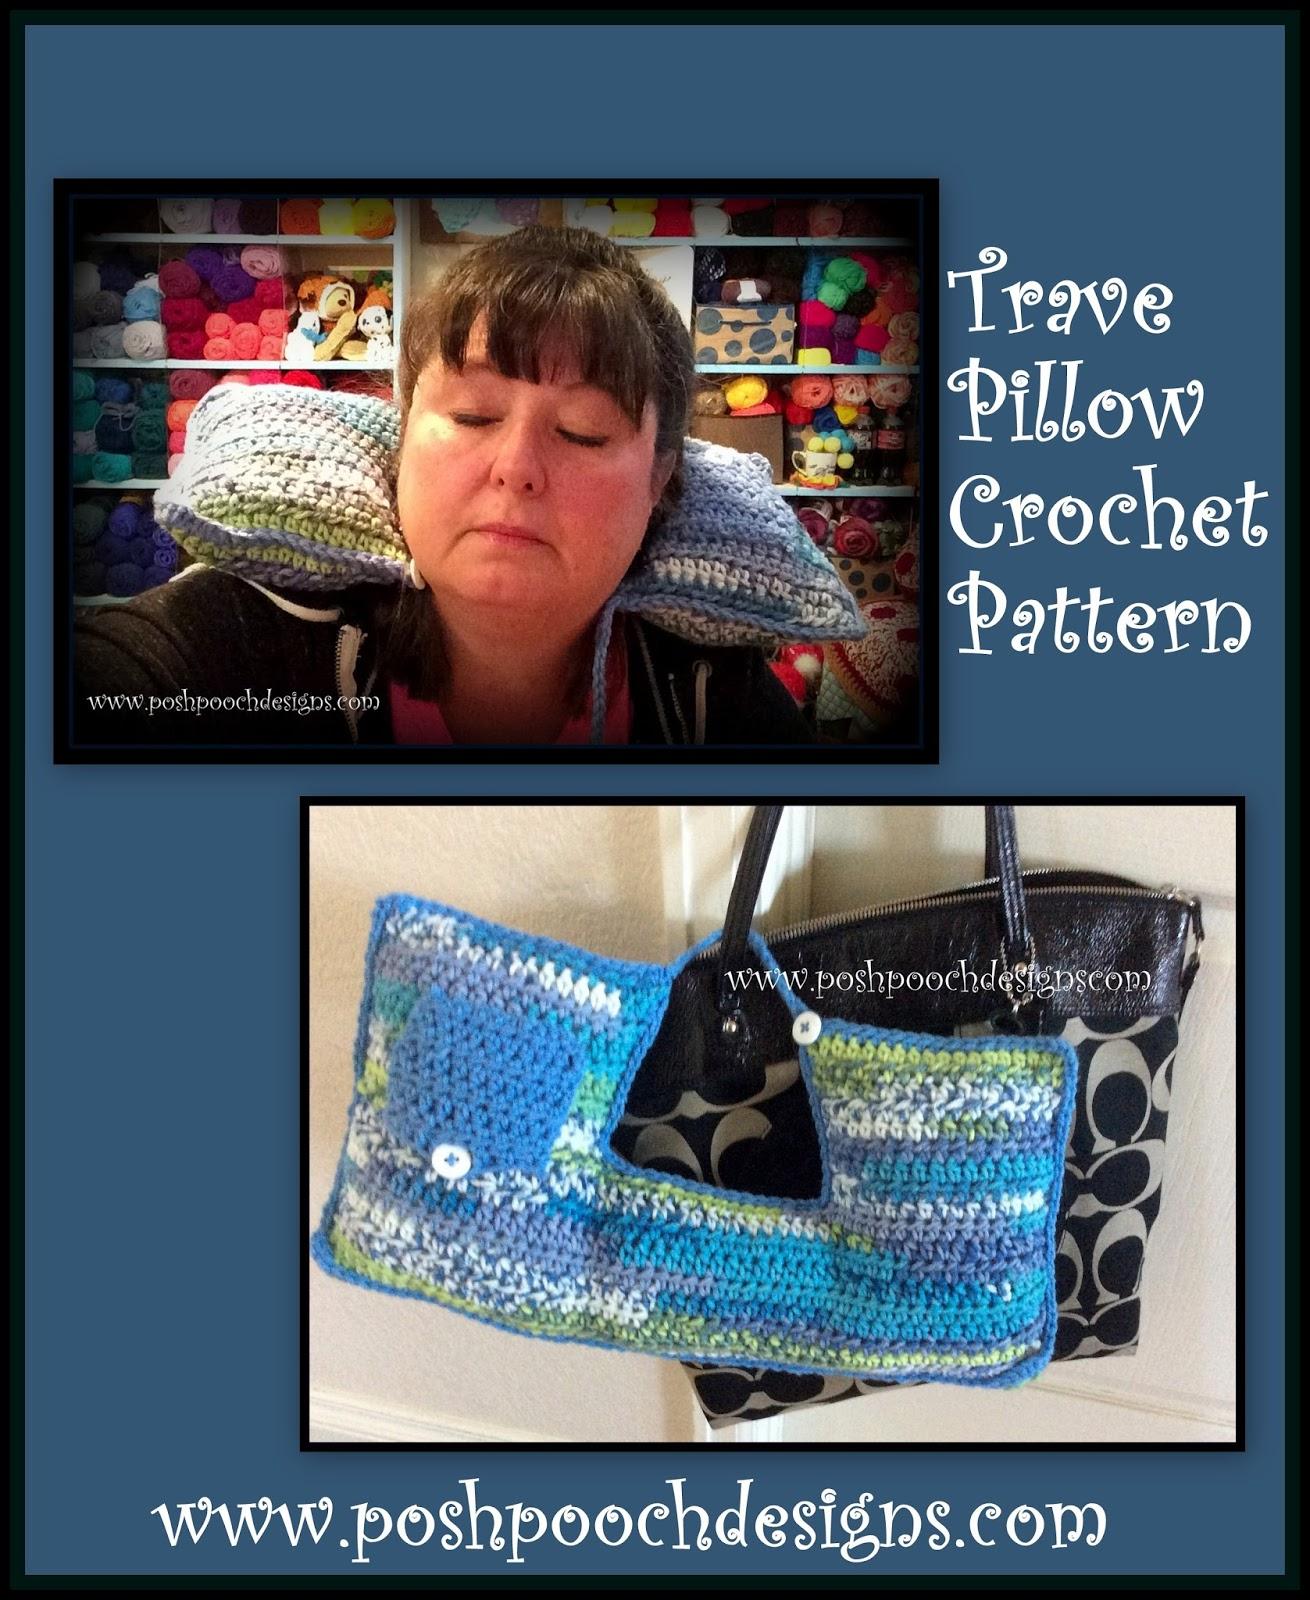 Posh Pooch Designs Dog Clothes: Travel Neck Pillow Crochet Pattern